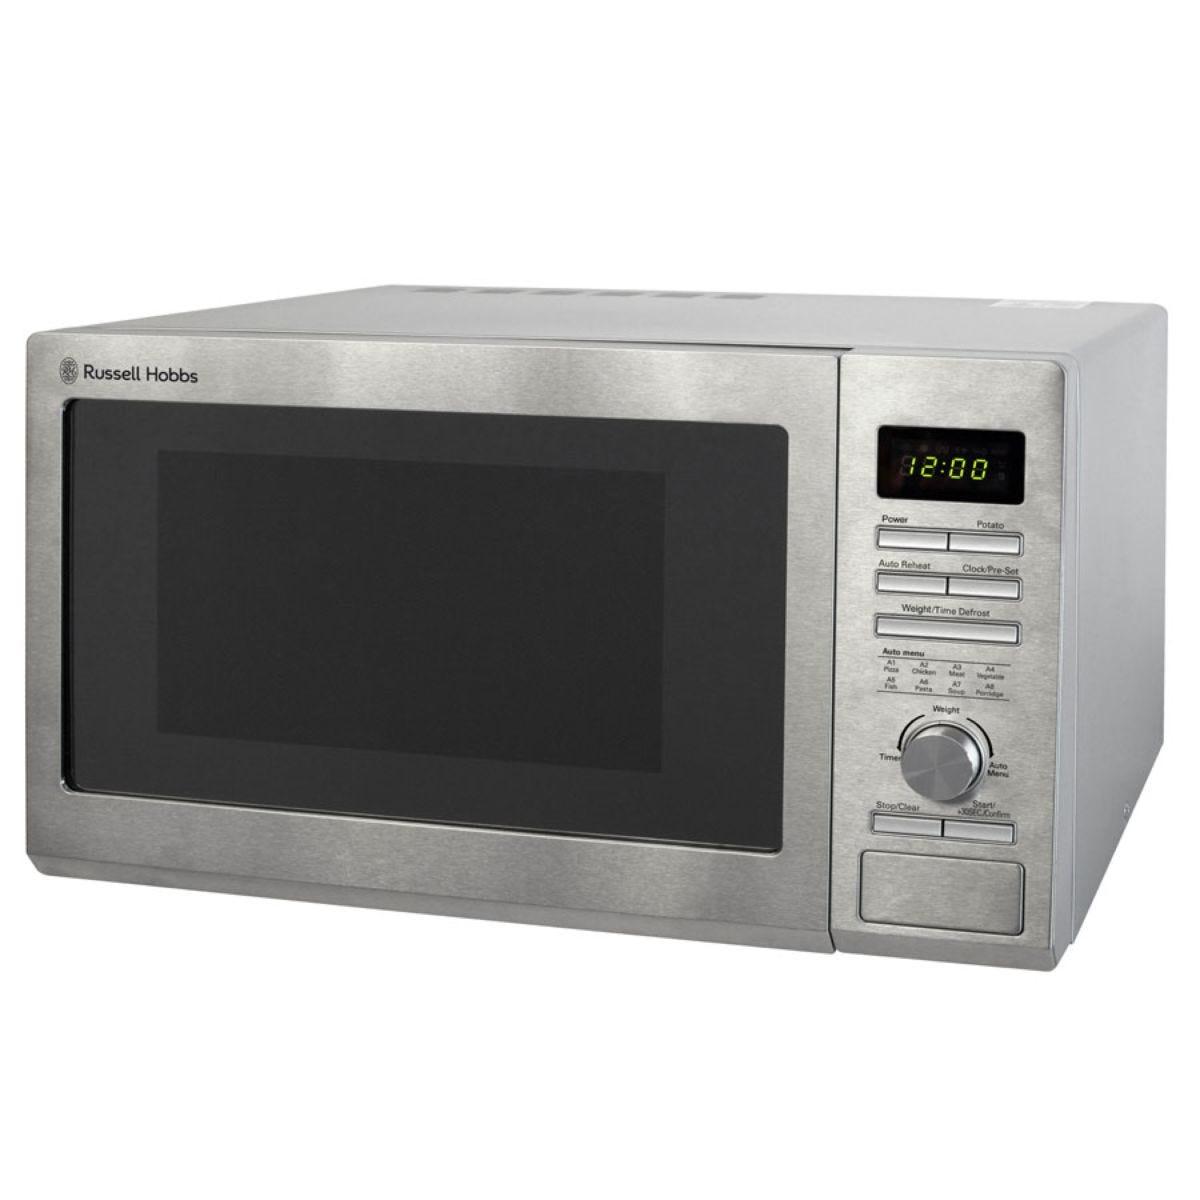 Russell Hobbs RHM2563 900W 25L Digital Microwave – Silver